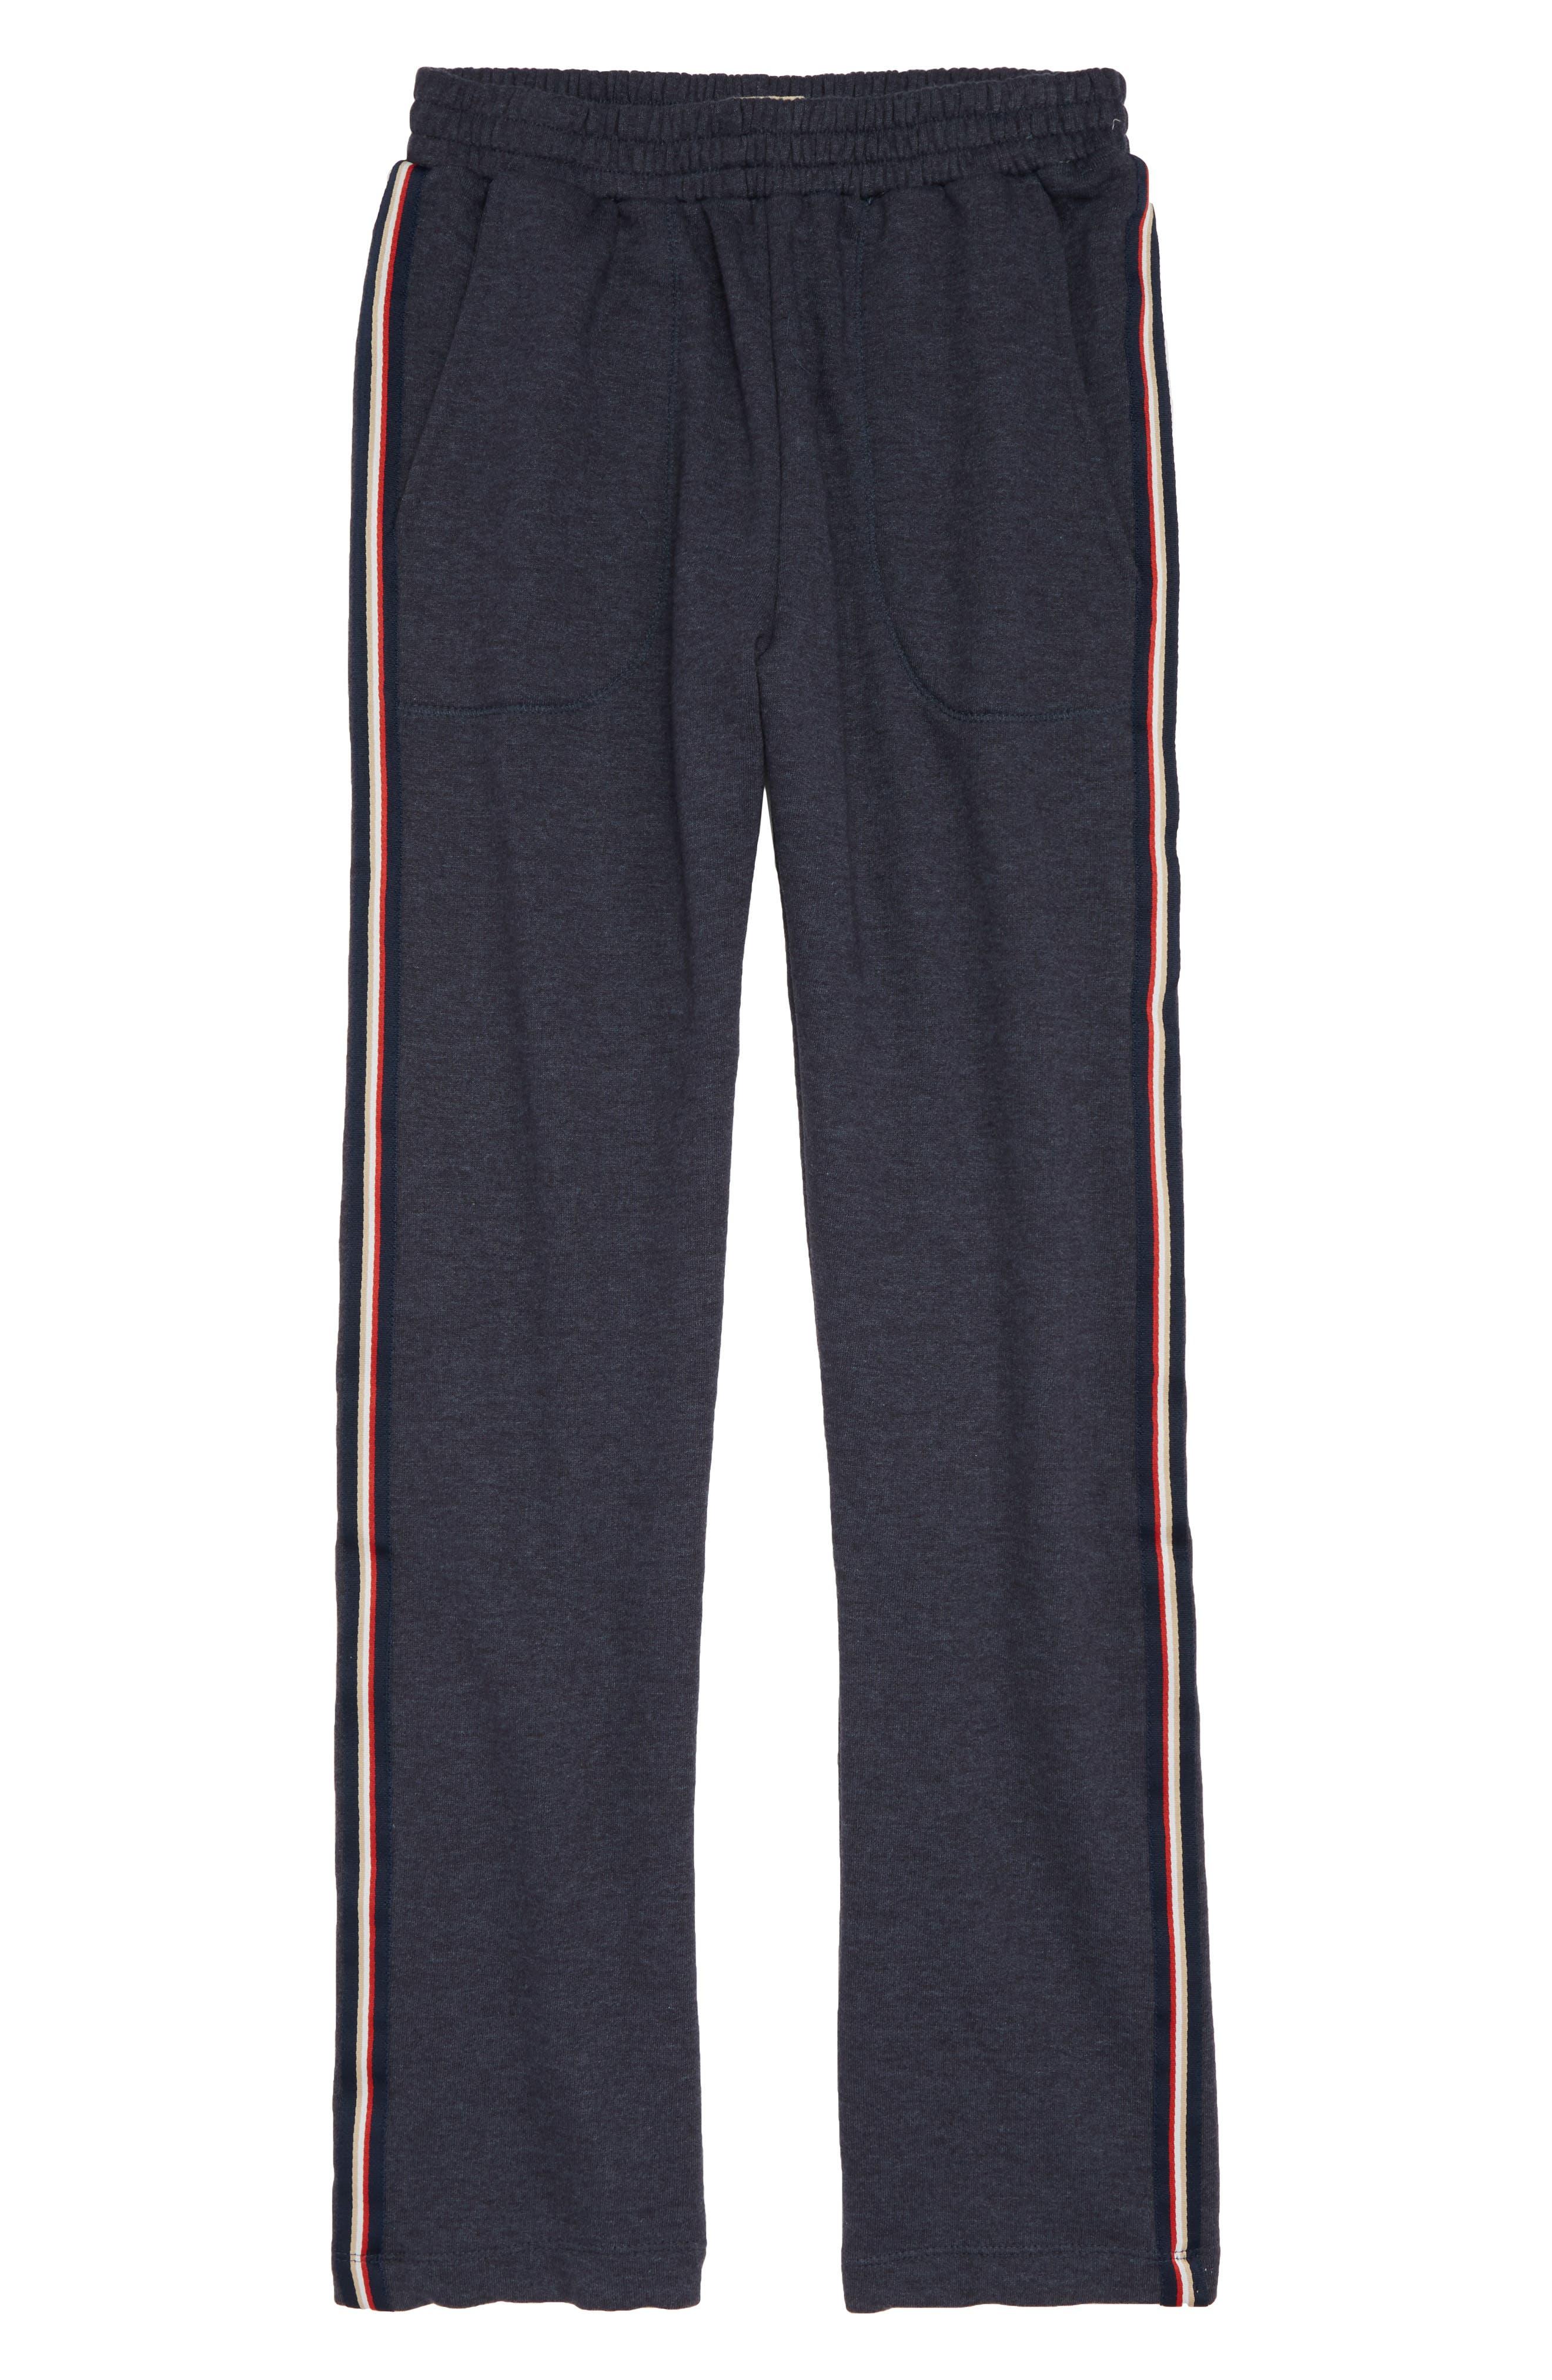 Peek Miles Jogger Pants,                         Main,                         color, 412